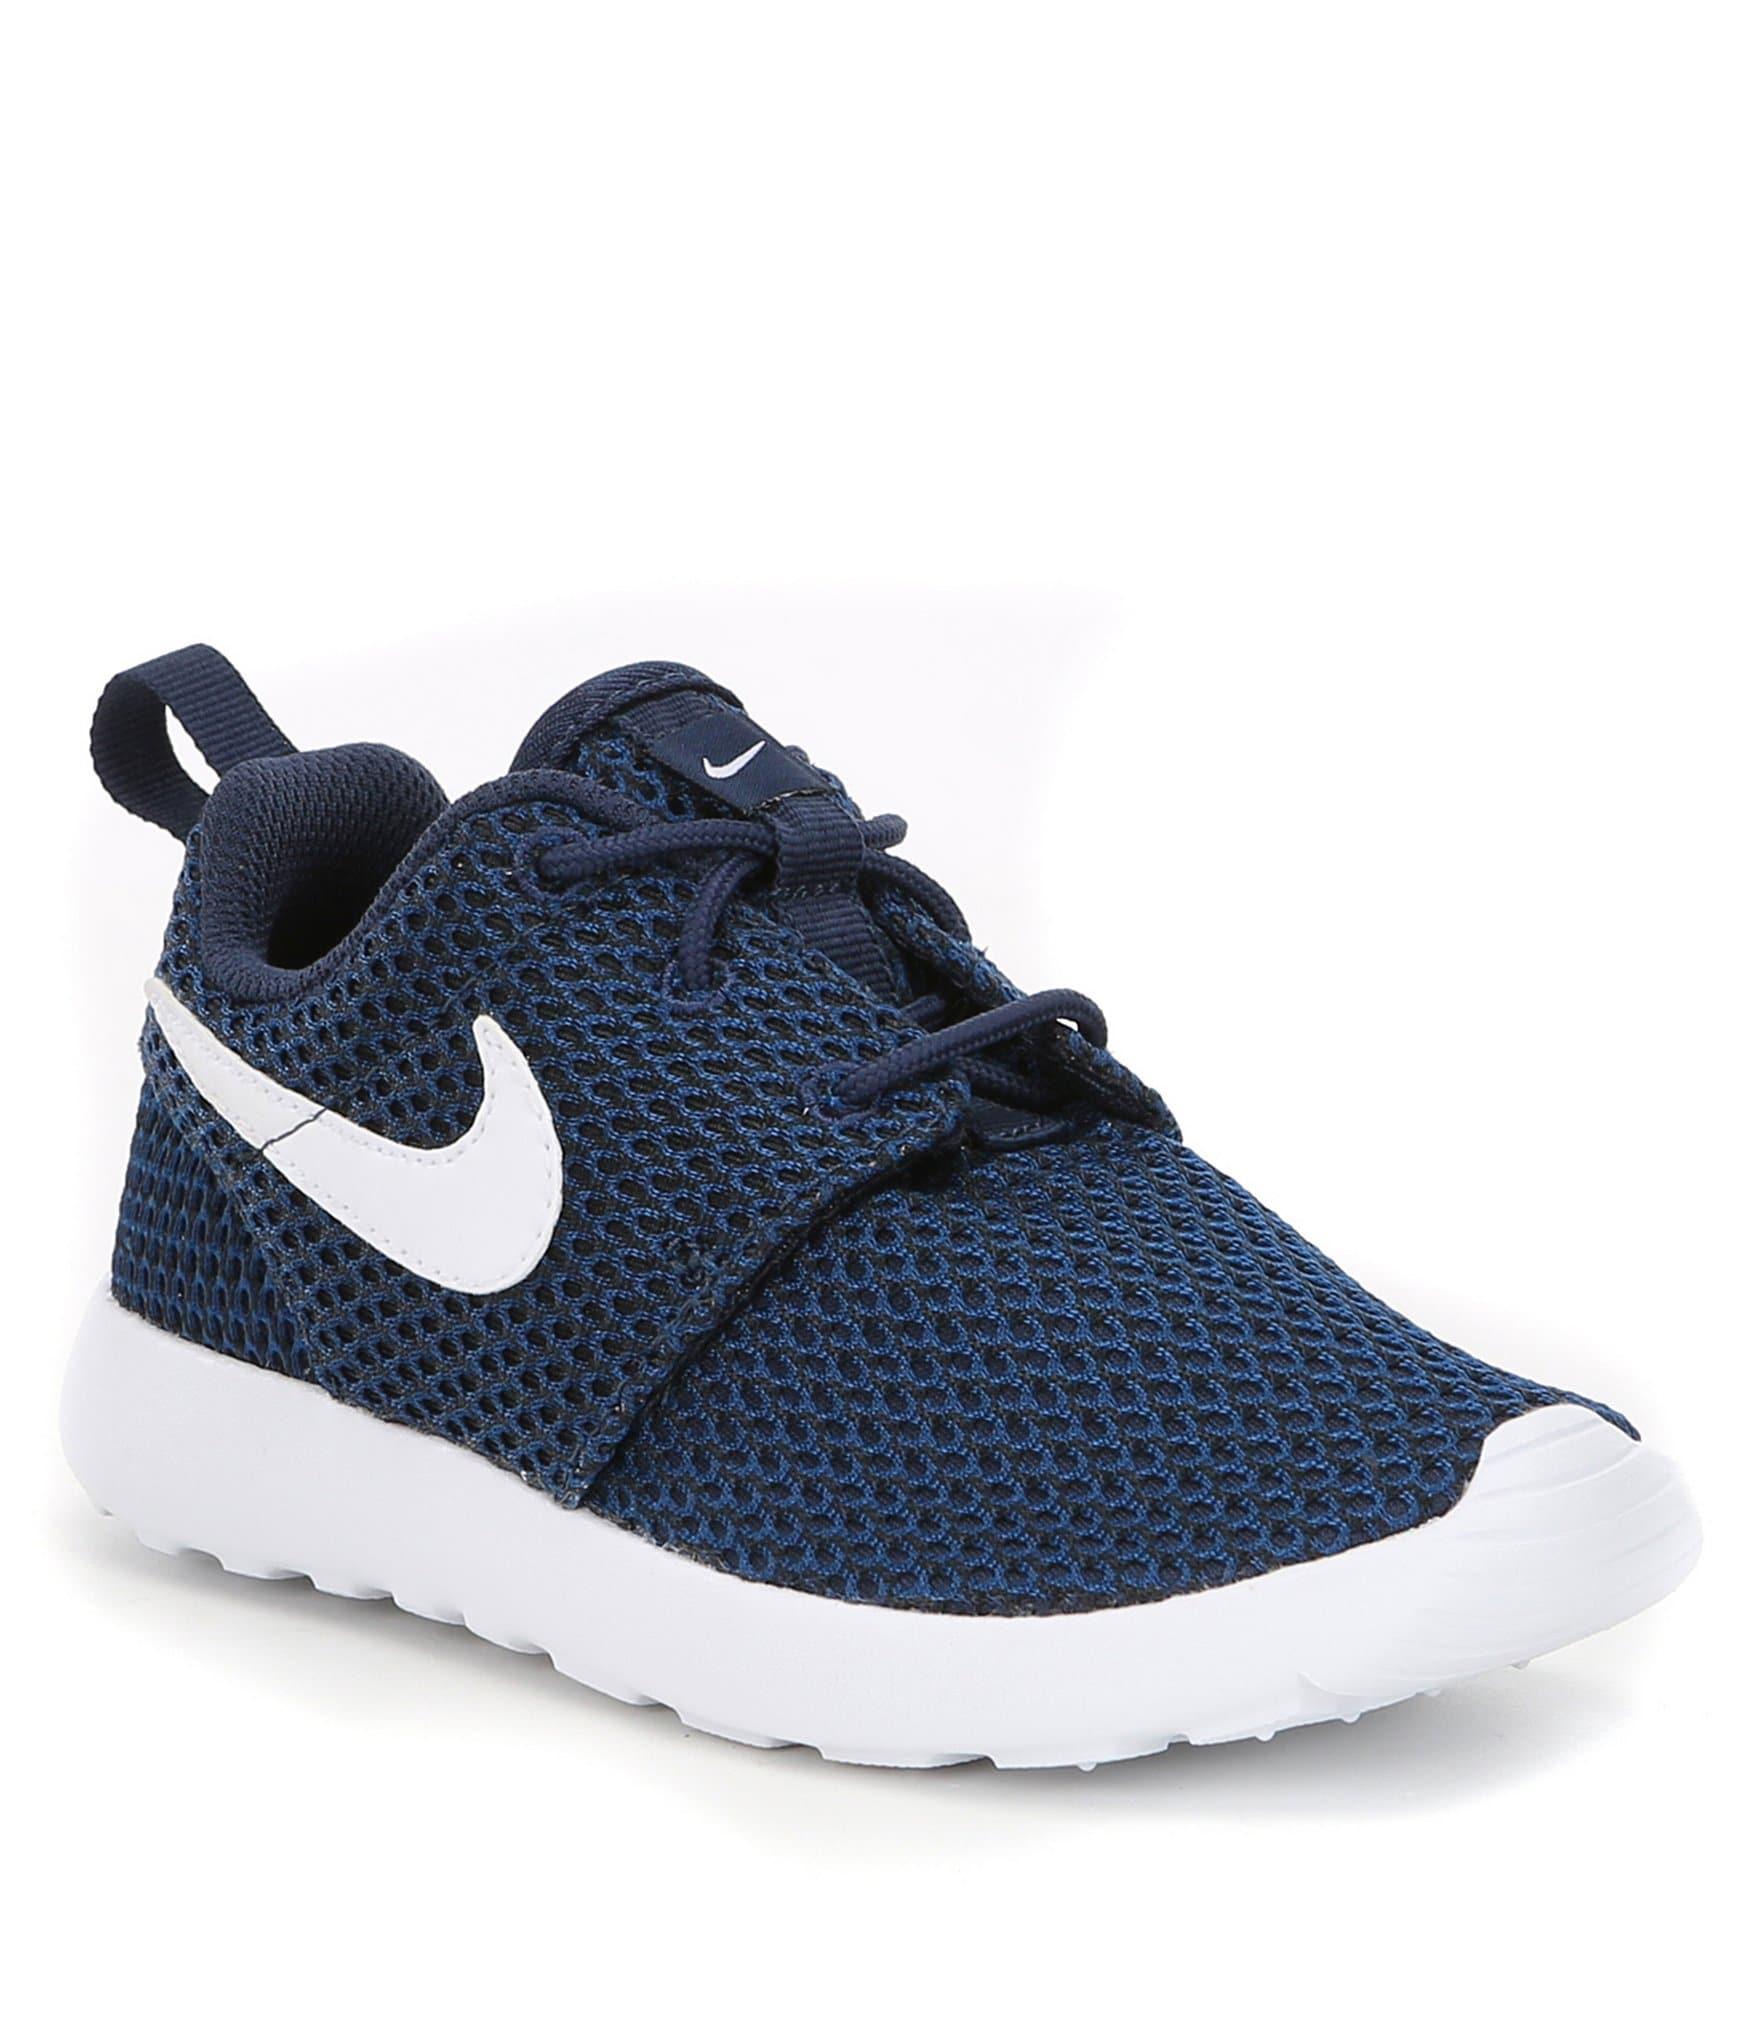 Nike Boys Roshe One Running Shoes Dillards